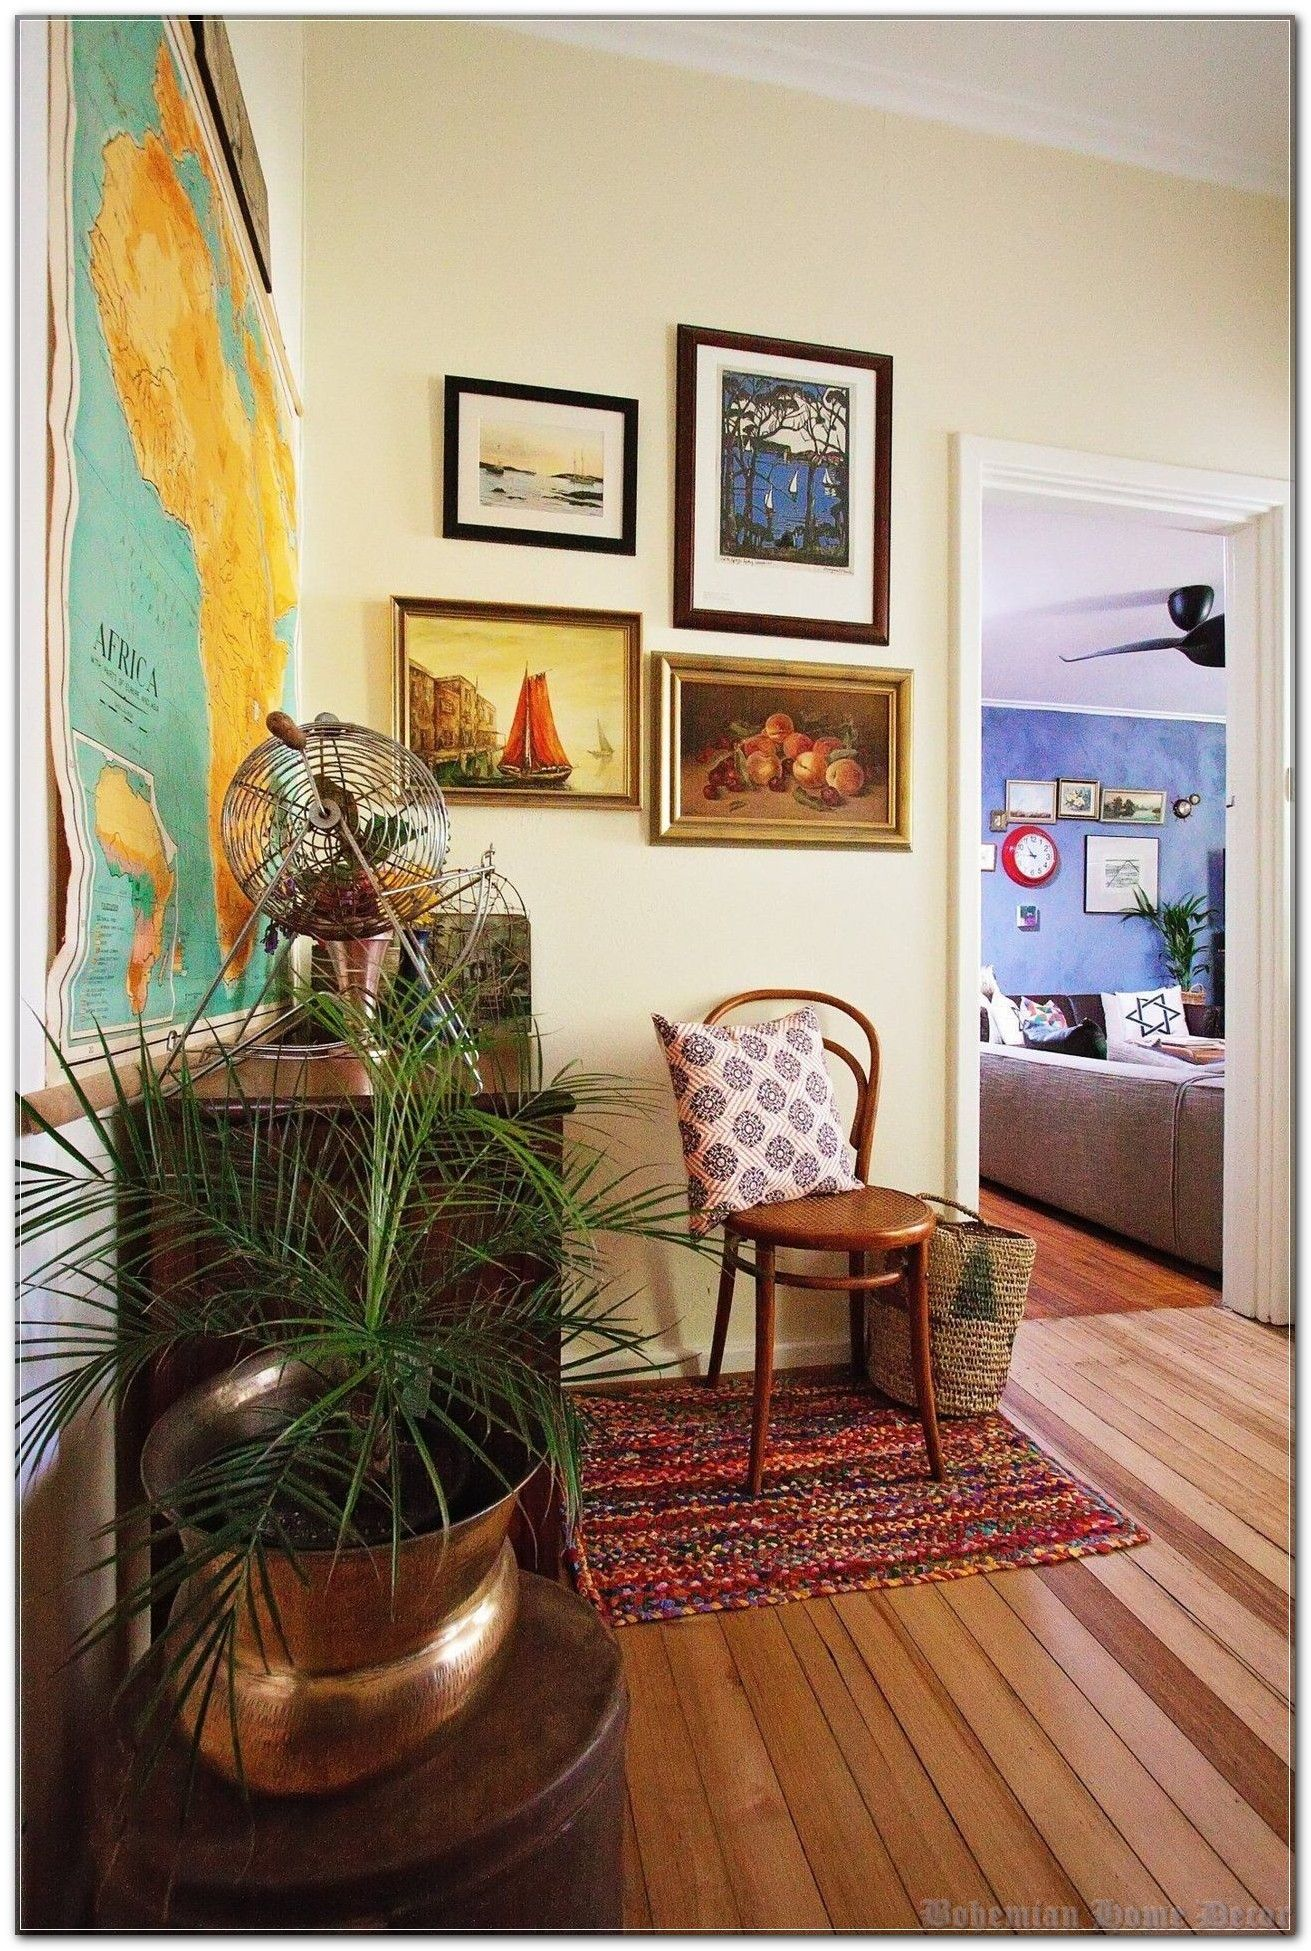 Bohemian Home Decor: Keep It Simple (And Stupid)